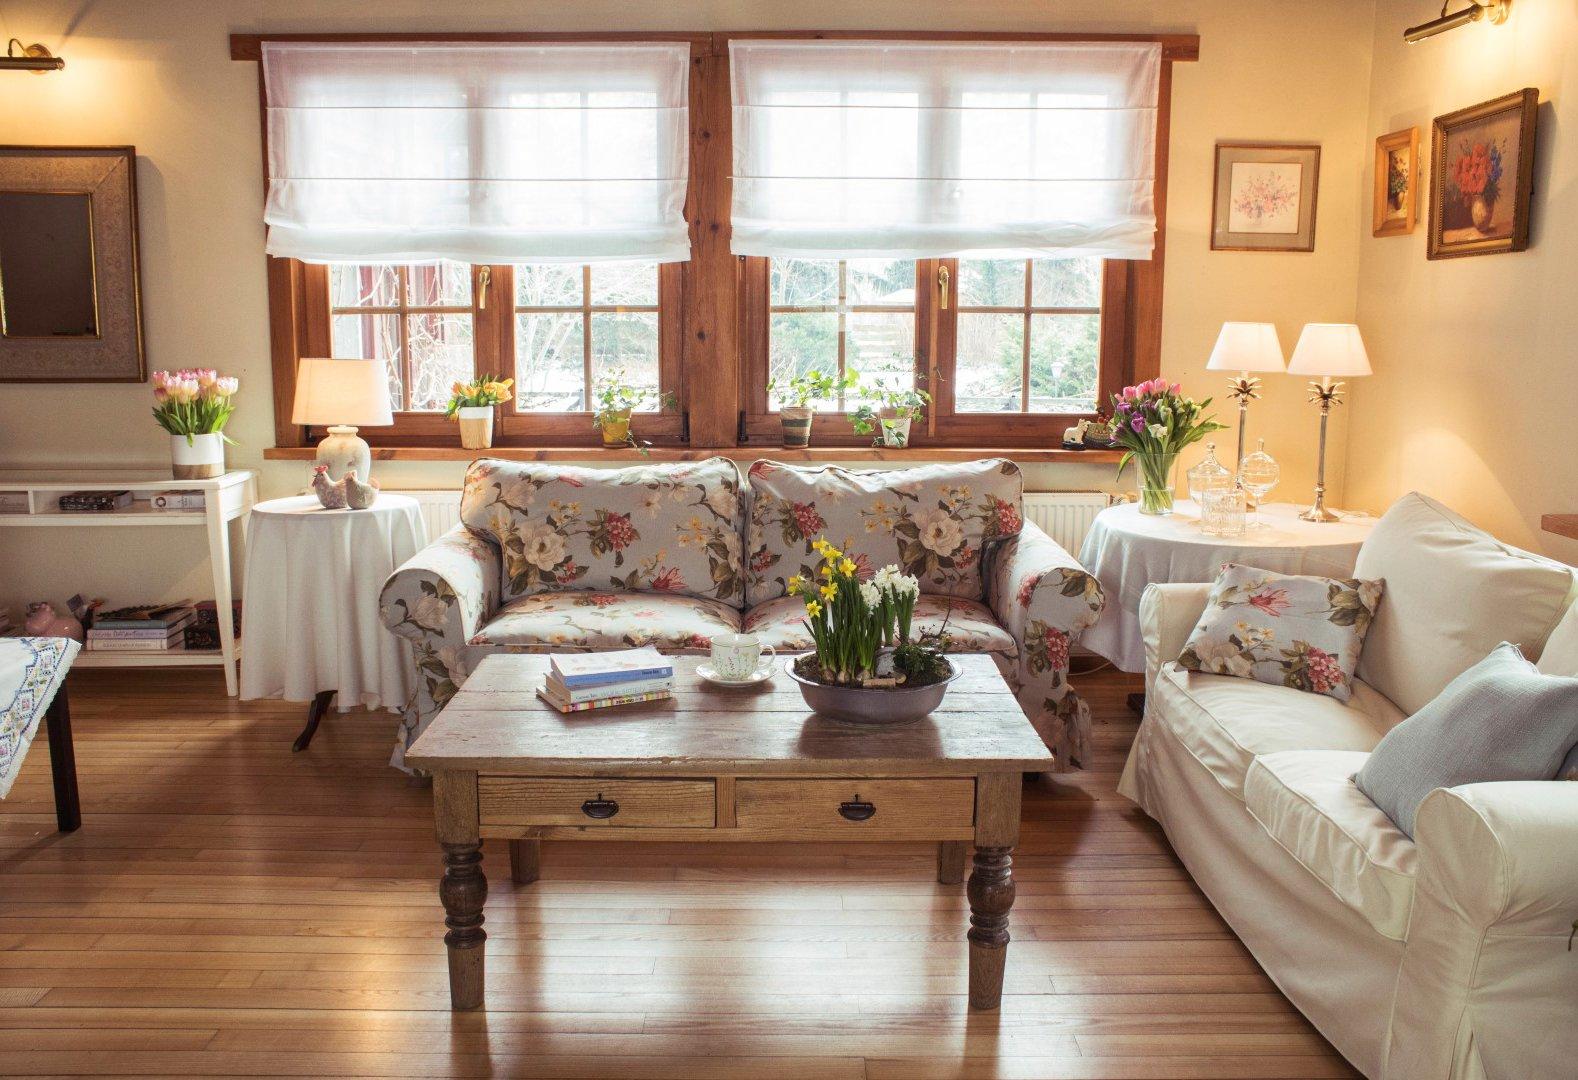 Przytulny salon na wiosnę